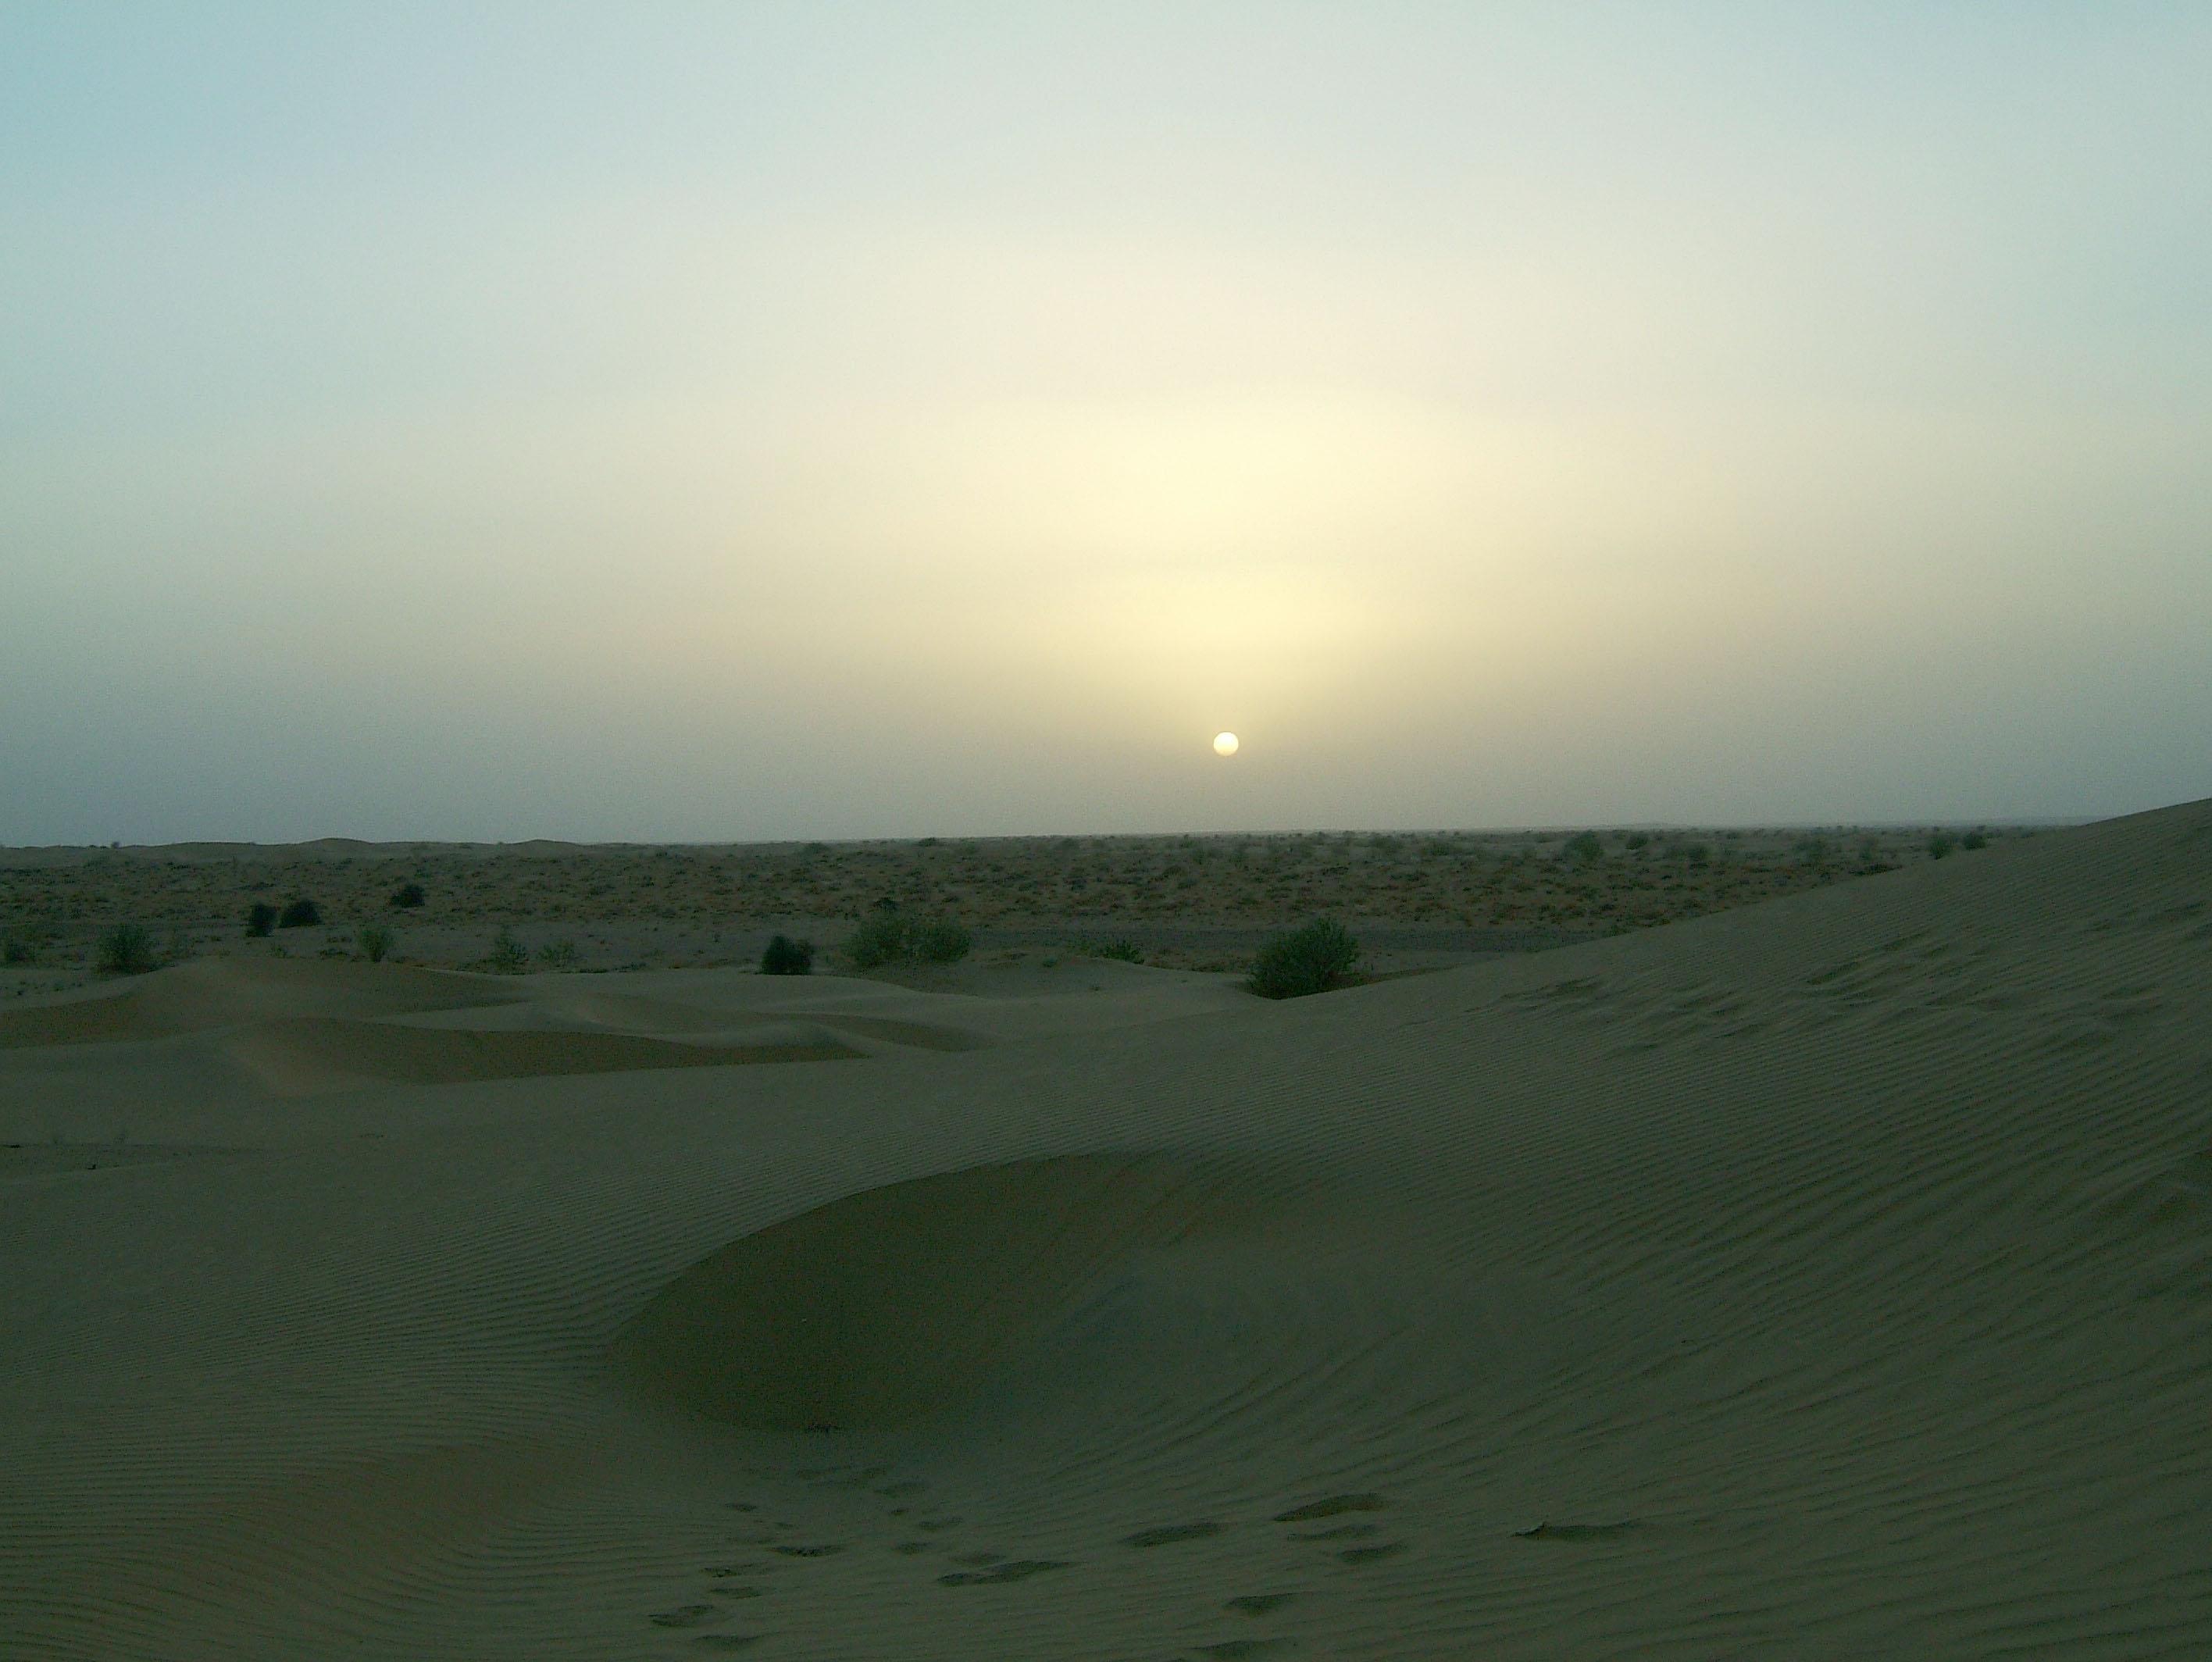 Sunset India Rajasthan Jaisalmer 01